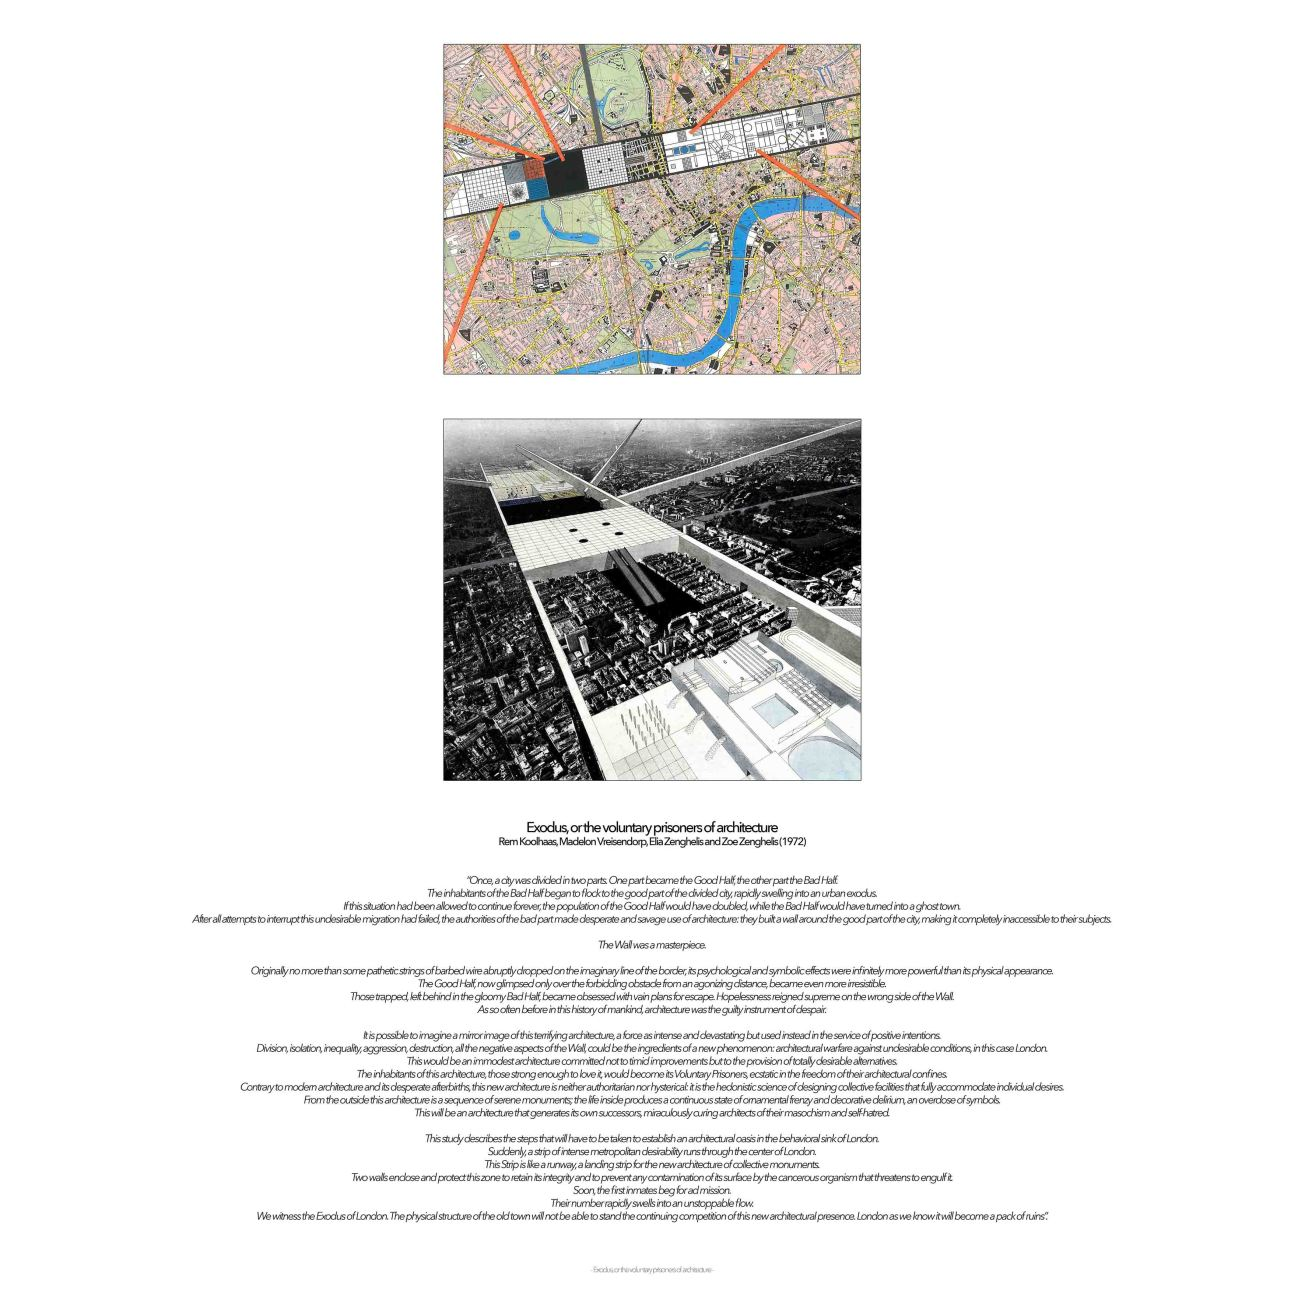 a modern Eden, Luca Minotti, 2016_17-University of Bologna-master thesis project, 01.jpg